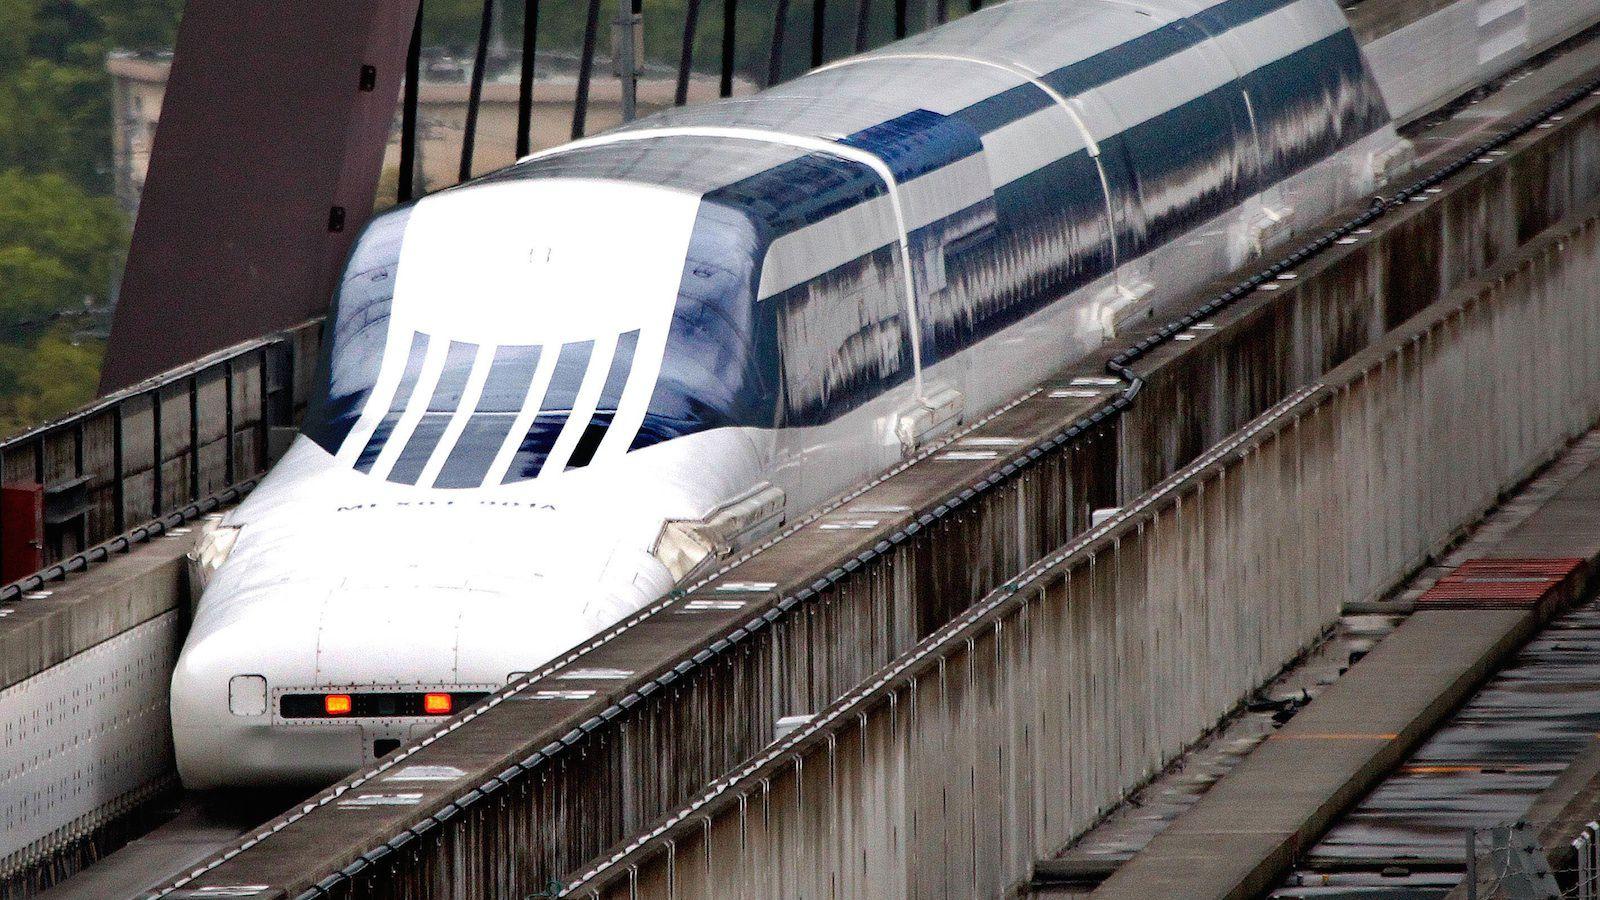 Drawn railroad speeding bullet You in than under train